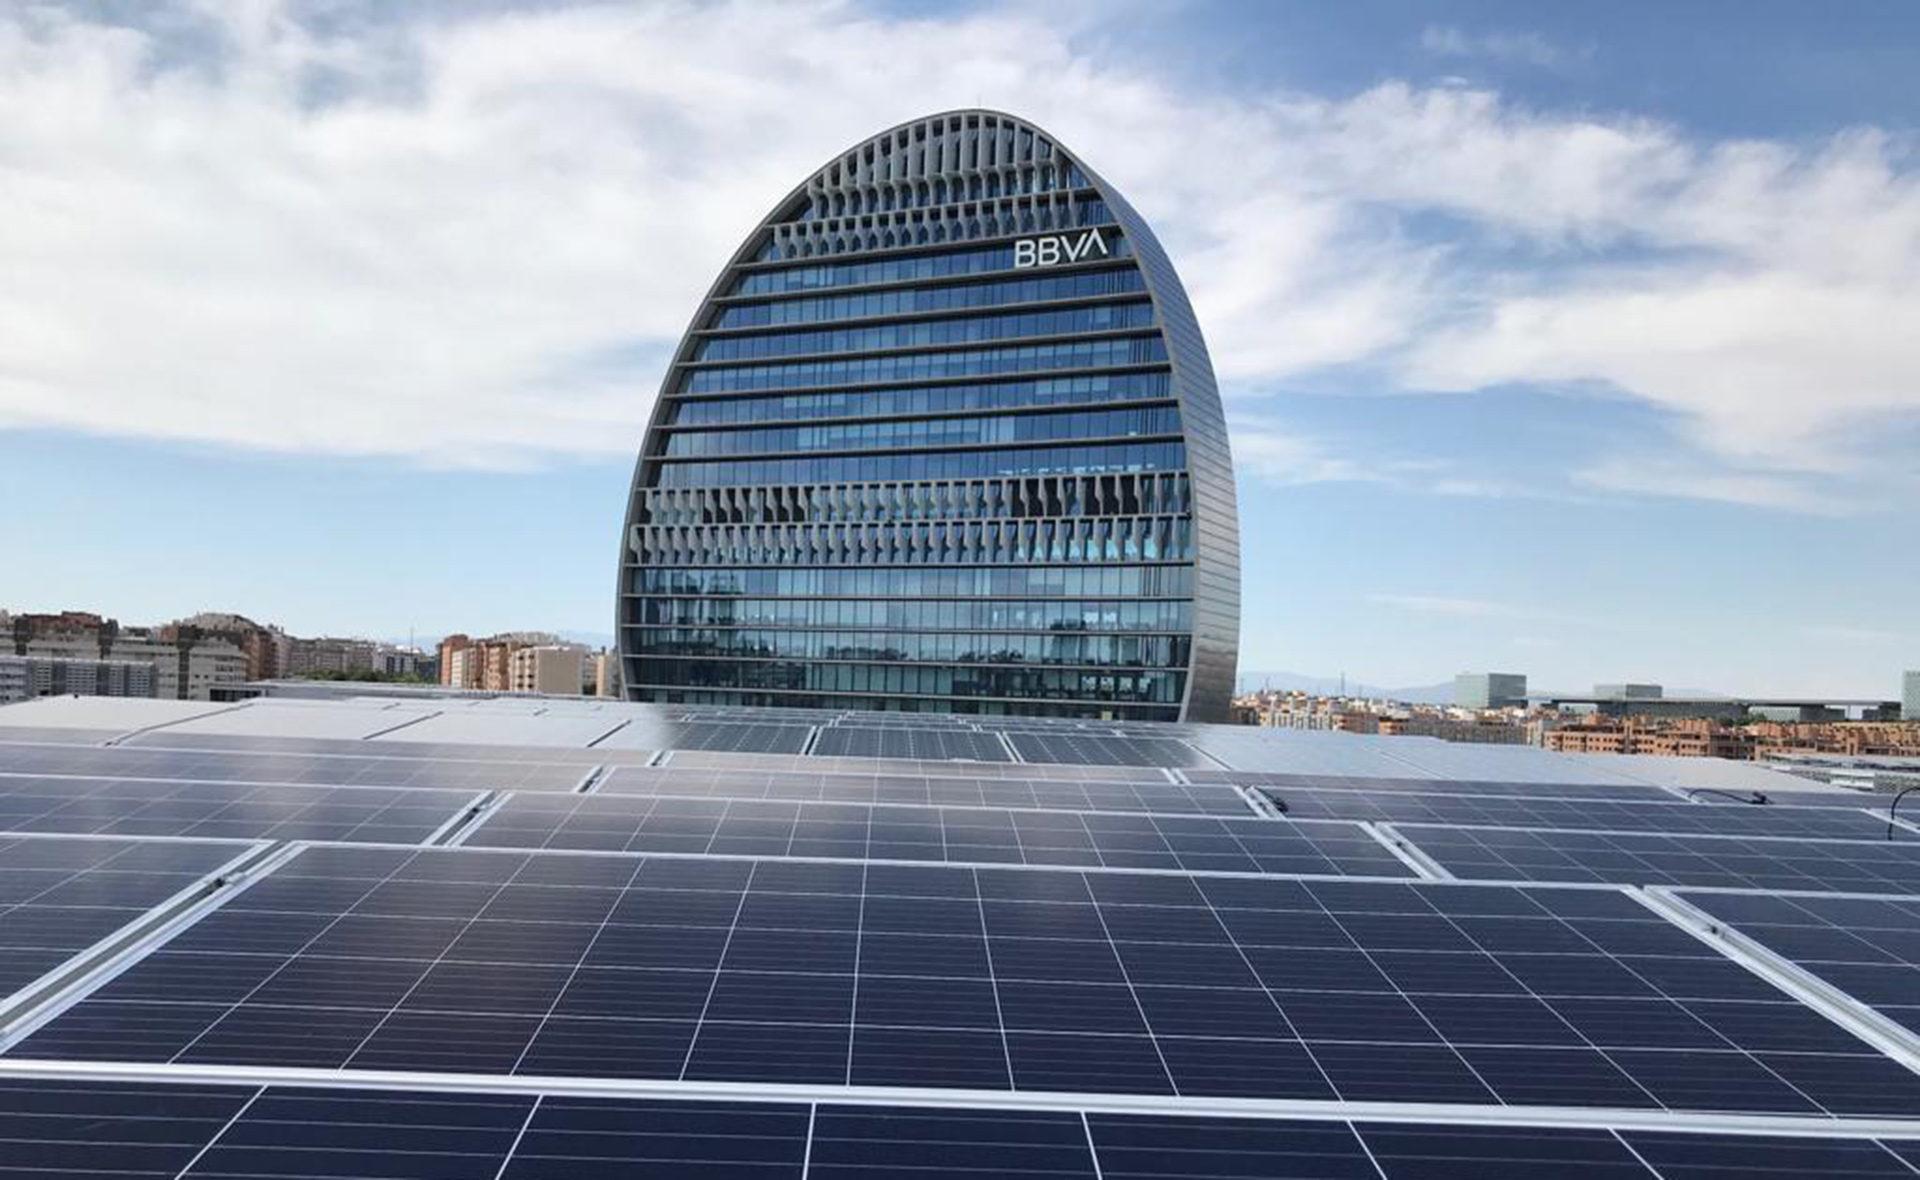 paneles solares en BBVA